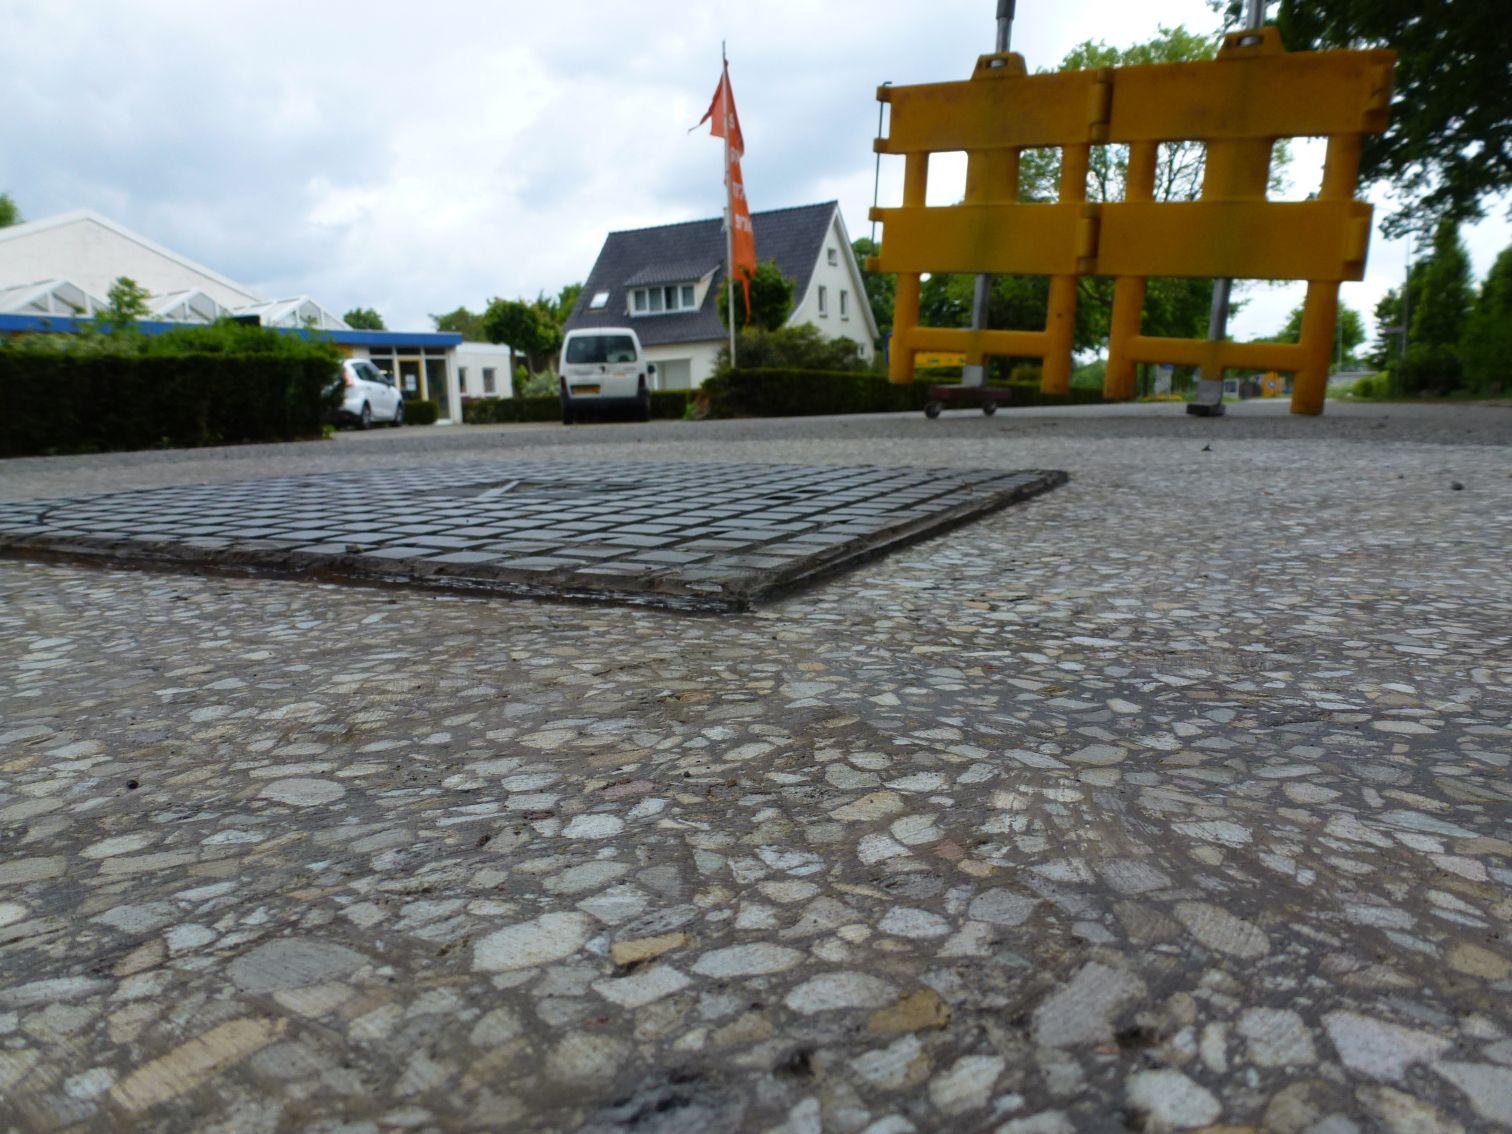 asfalt verwijderd